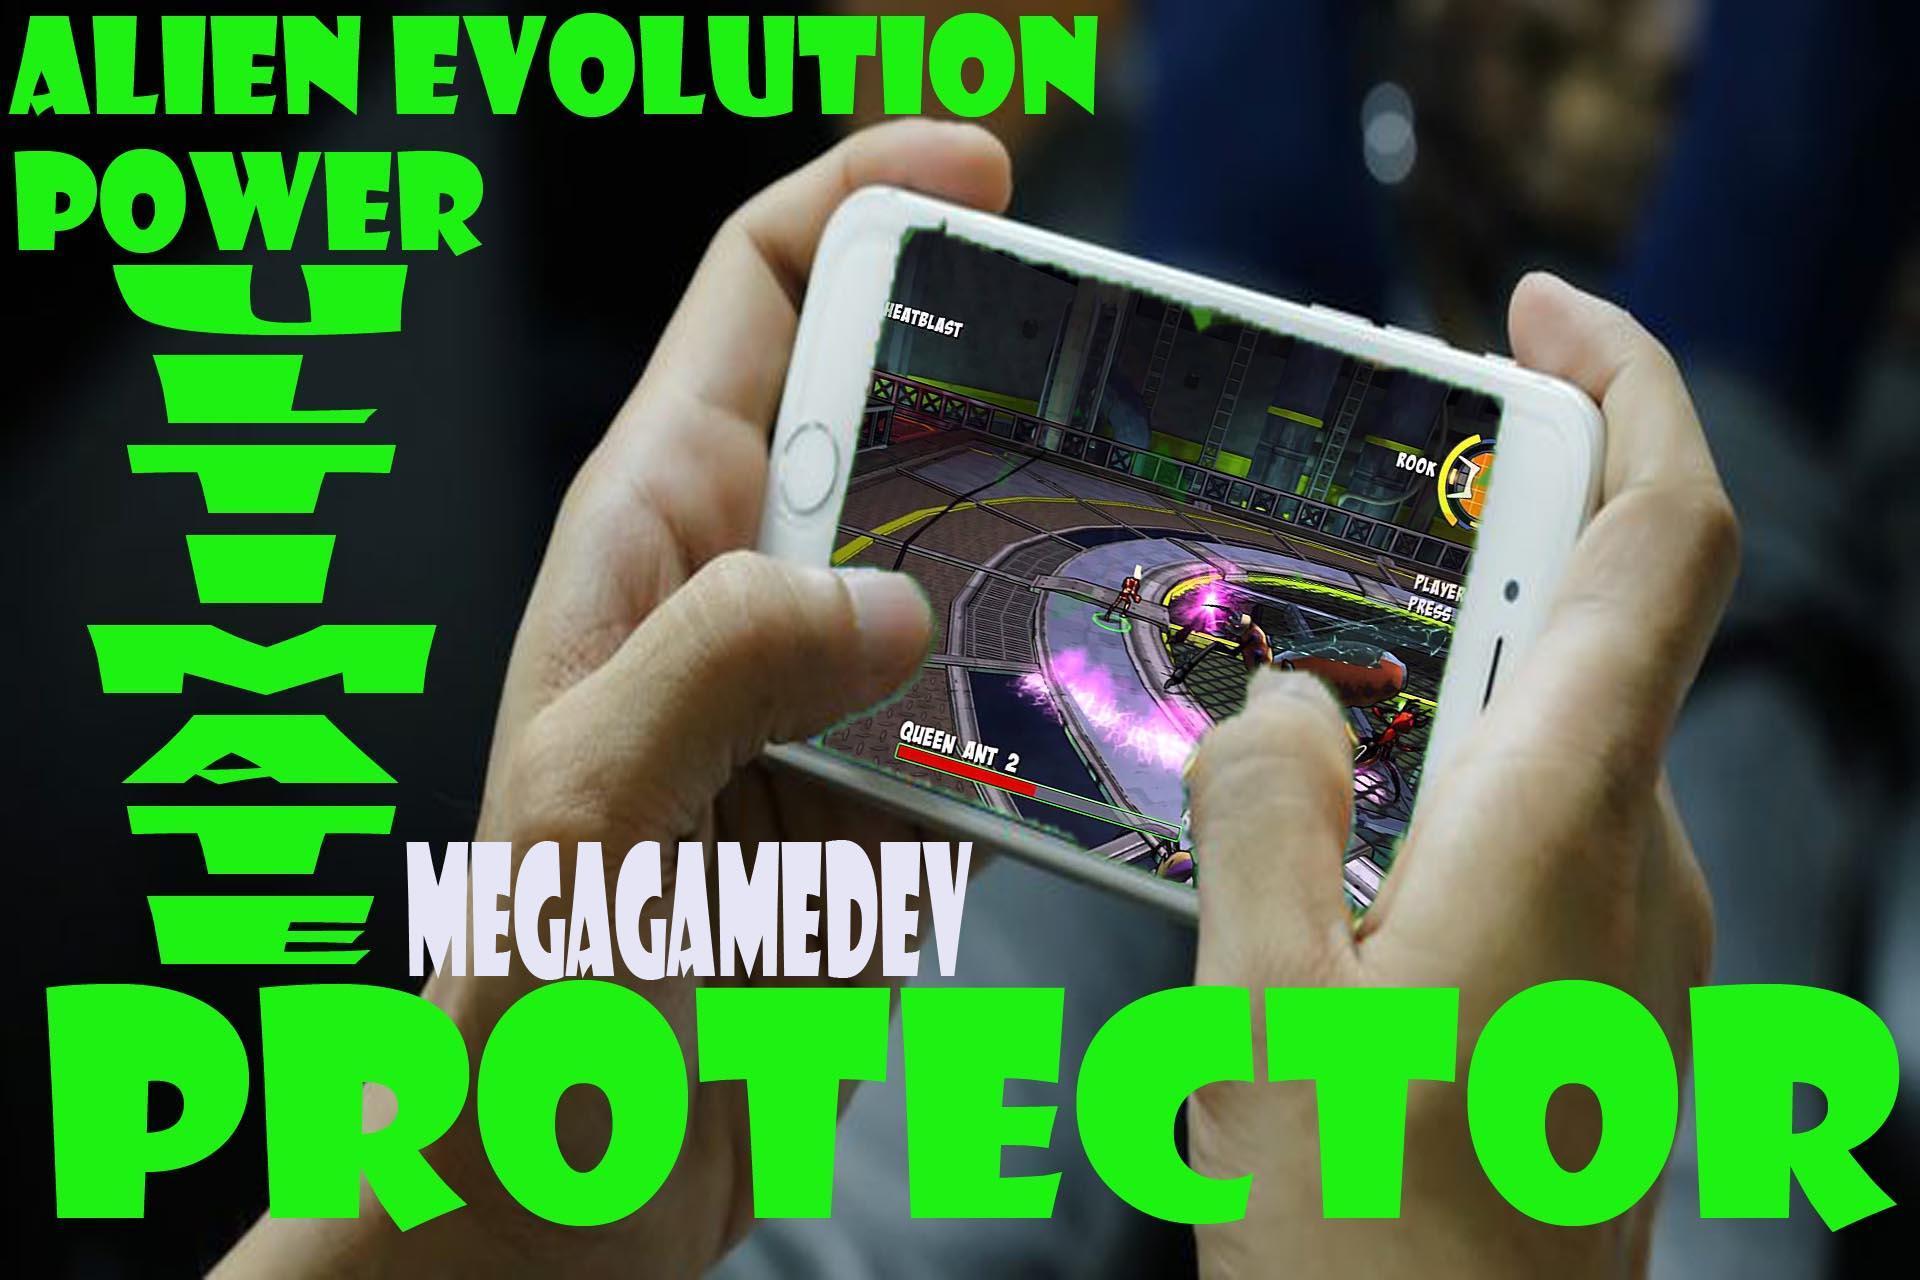 Alien Evolution : Power Ultimate 10 Protector 4.c Screenshot 4